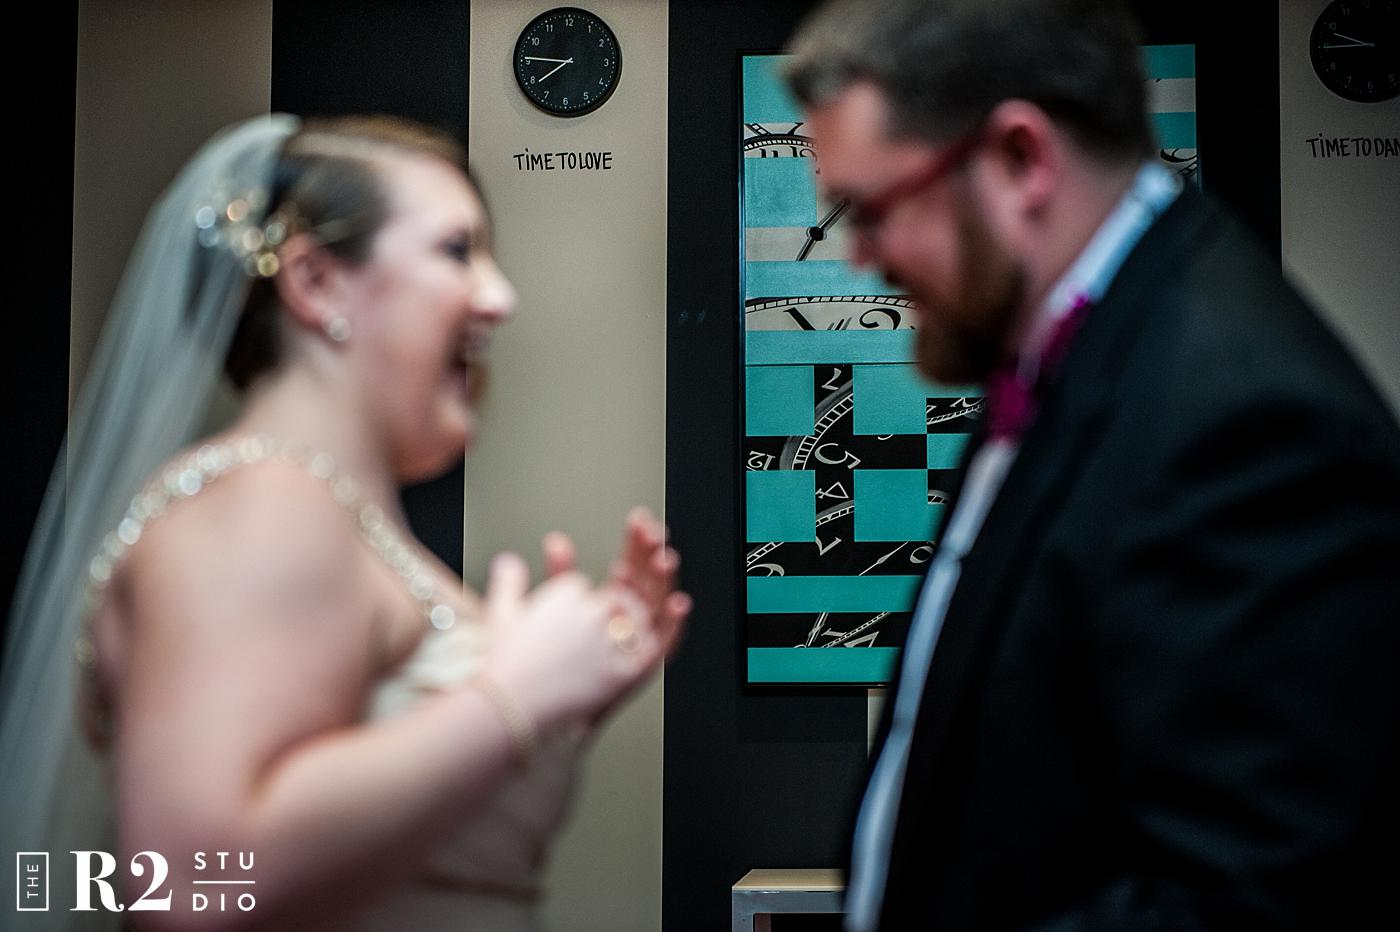 #slslasvegaswedding #slslasvegas #timetolove #slswedding #slsweddingplanner #slslasvegasweddingplanner #weddingslslasvegasbazaarmeats #weddingplanningslslasvegas#desirableeventsbydesi, #weddingplannerlasvegas,#lasvegasweddingcoordinators,#weddingcoordinatorslasvegas,#weddingcoordinatorlasvegas,#lasvegasweddingplanner #desirableeventsbydesi #Tropicanawedding #wedding, #love, #lovewins, #samesexwedding, #gaywedding, #tropicana, #lasvegaswedding, #weddinglasvegas, #weddingplannerslasvegas, #lasvegasweddingplanners, # layersoflovely, #lasvegaswedding, #susieandwill, #rusticwedding, #wedding, #historic5thstreetschool, #downtownlasvegas, #sls, #sayersclub, #bazaarmeats, #slslv, #slslasvegas #slsweddings, #lasvegasweddings,